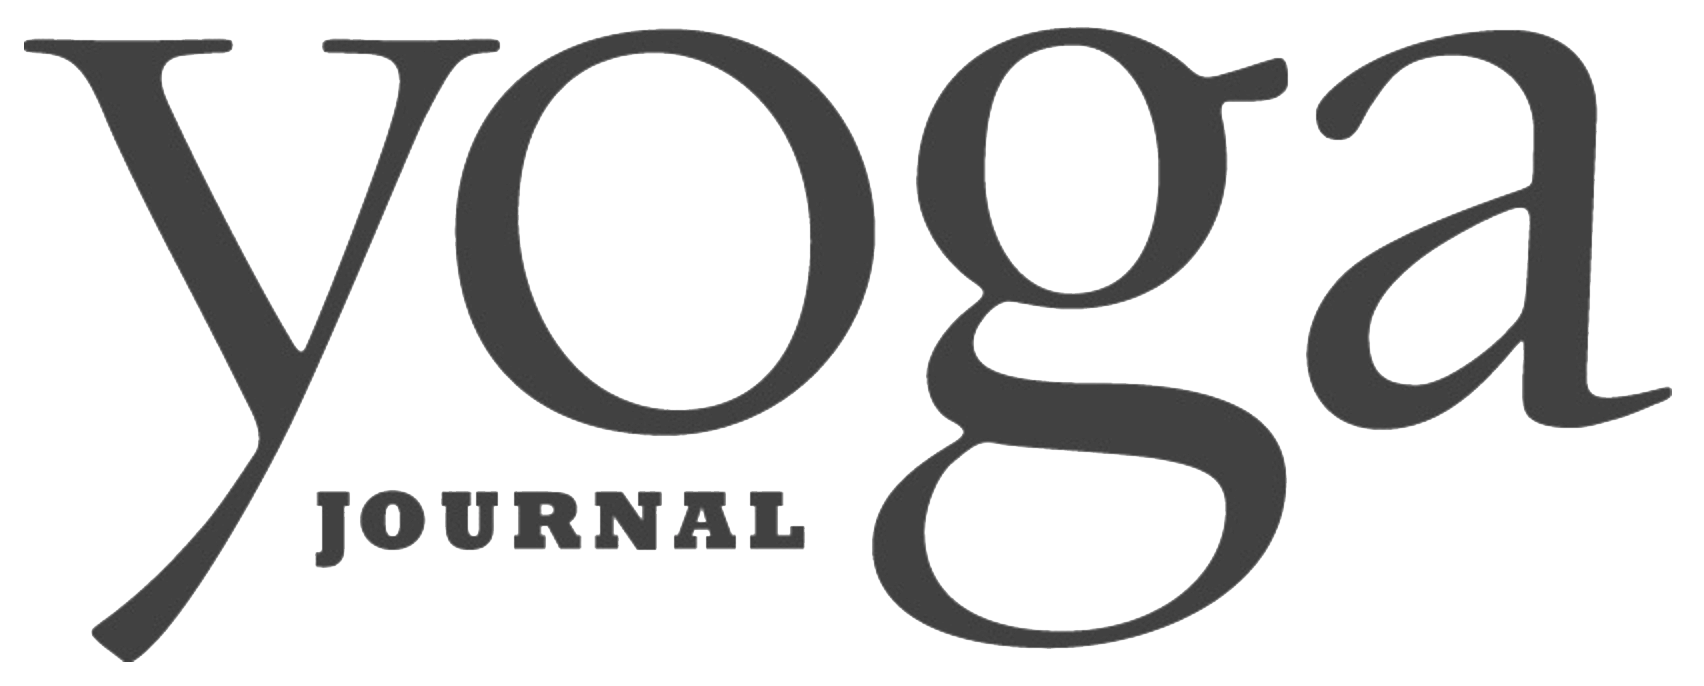 Seth-Kaufman-Press-Yoga-Journal-Logo